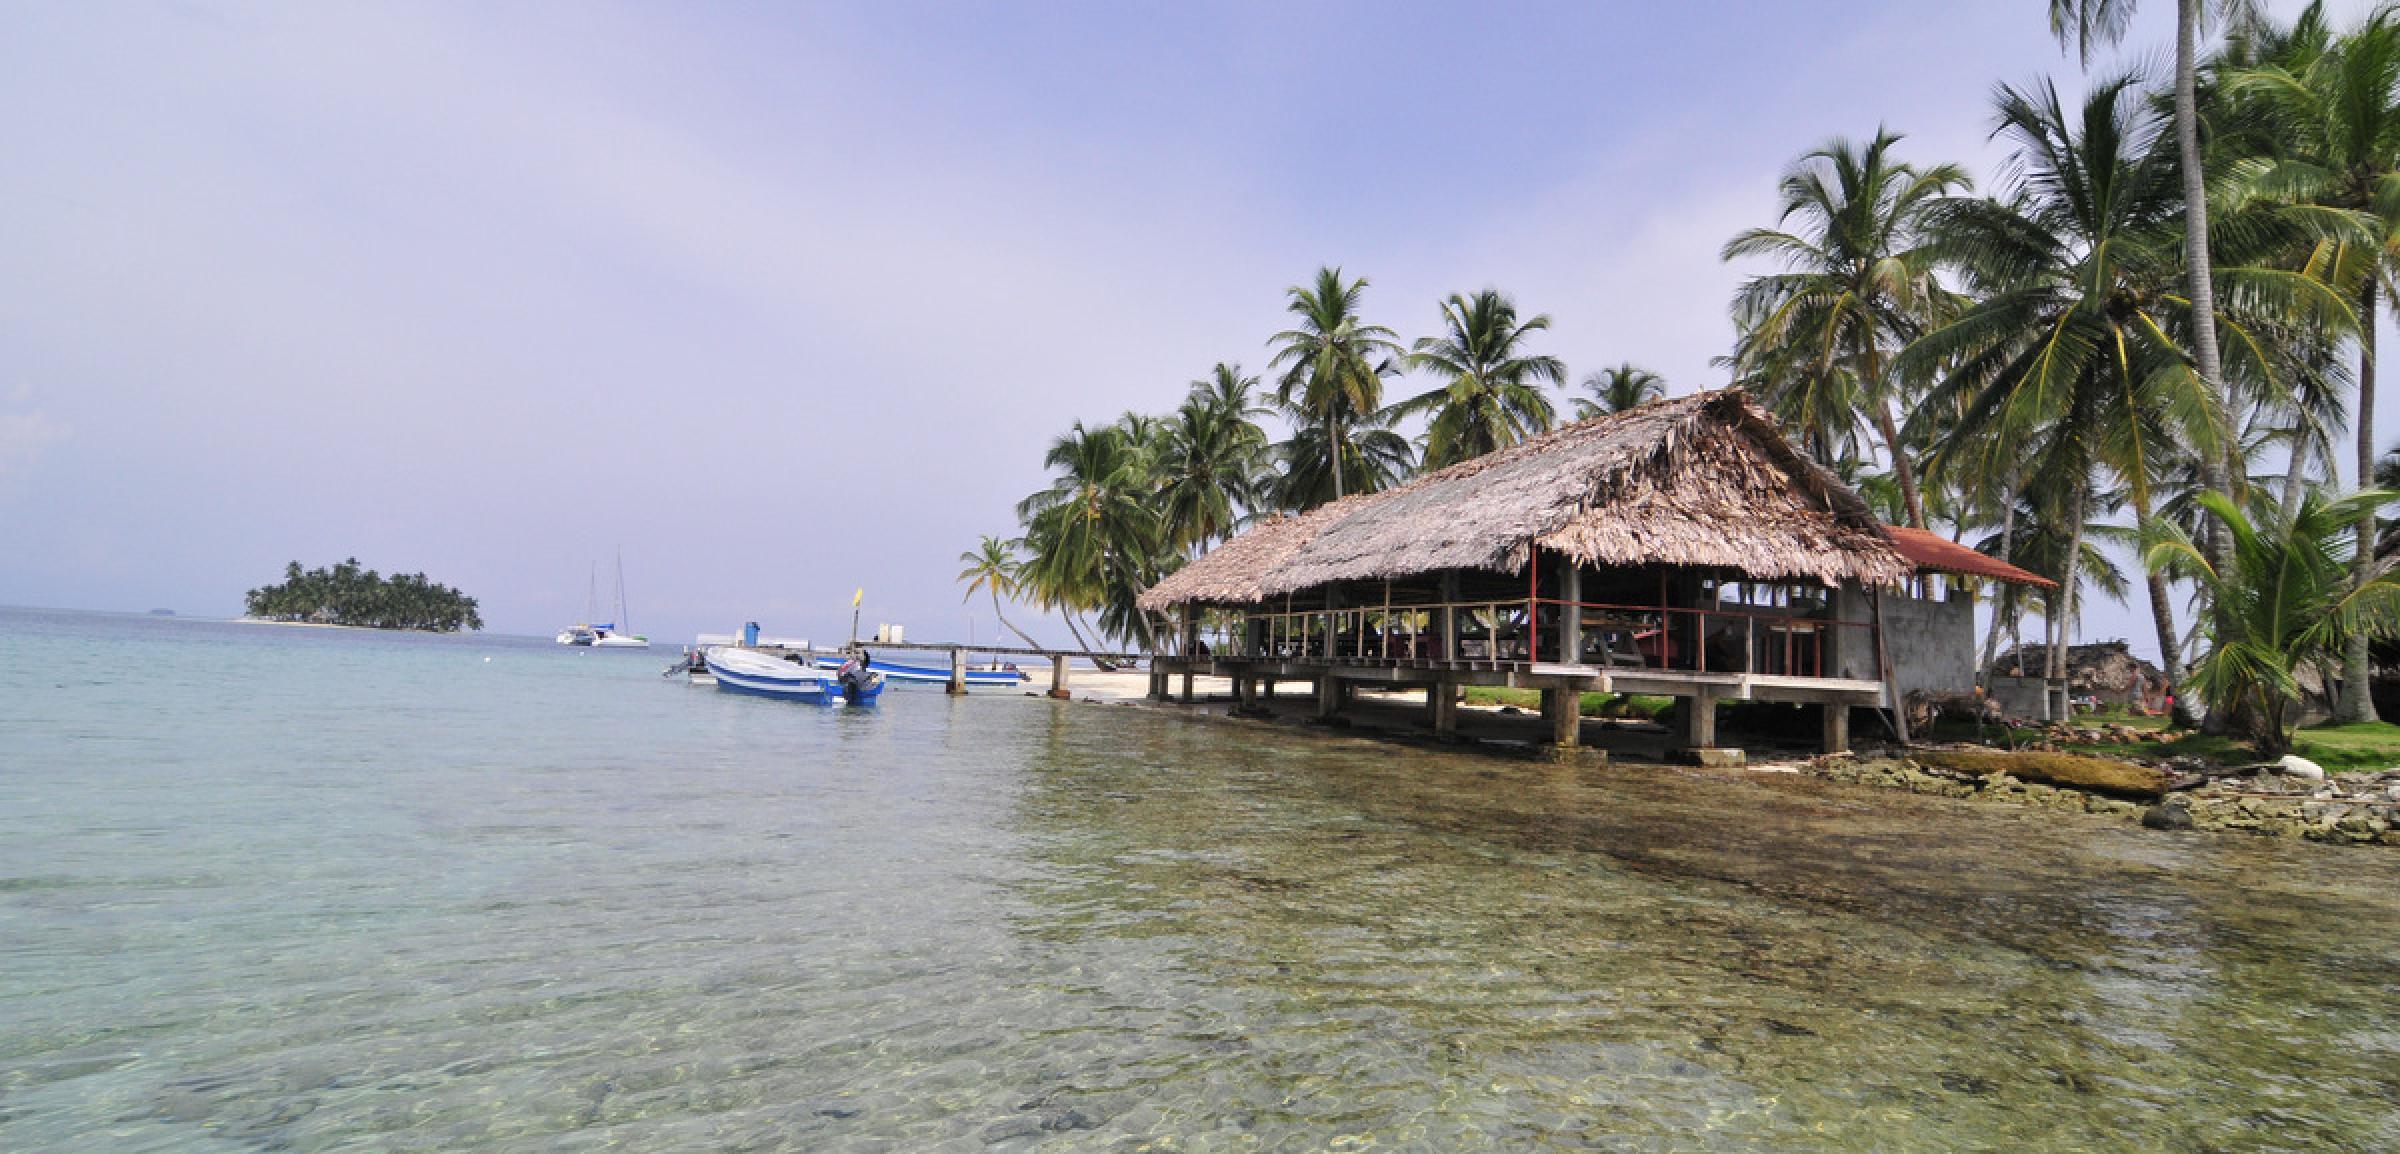 Guanidup Island